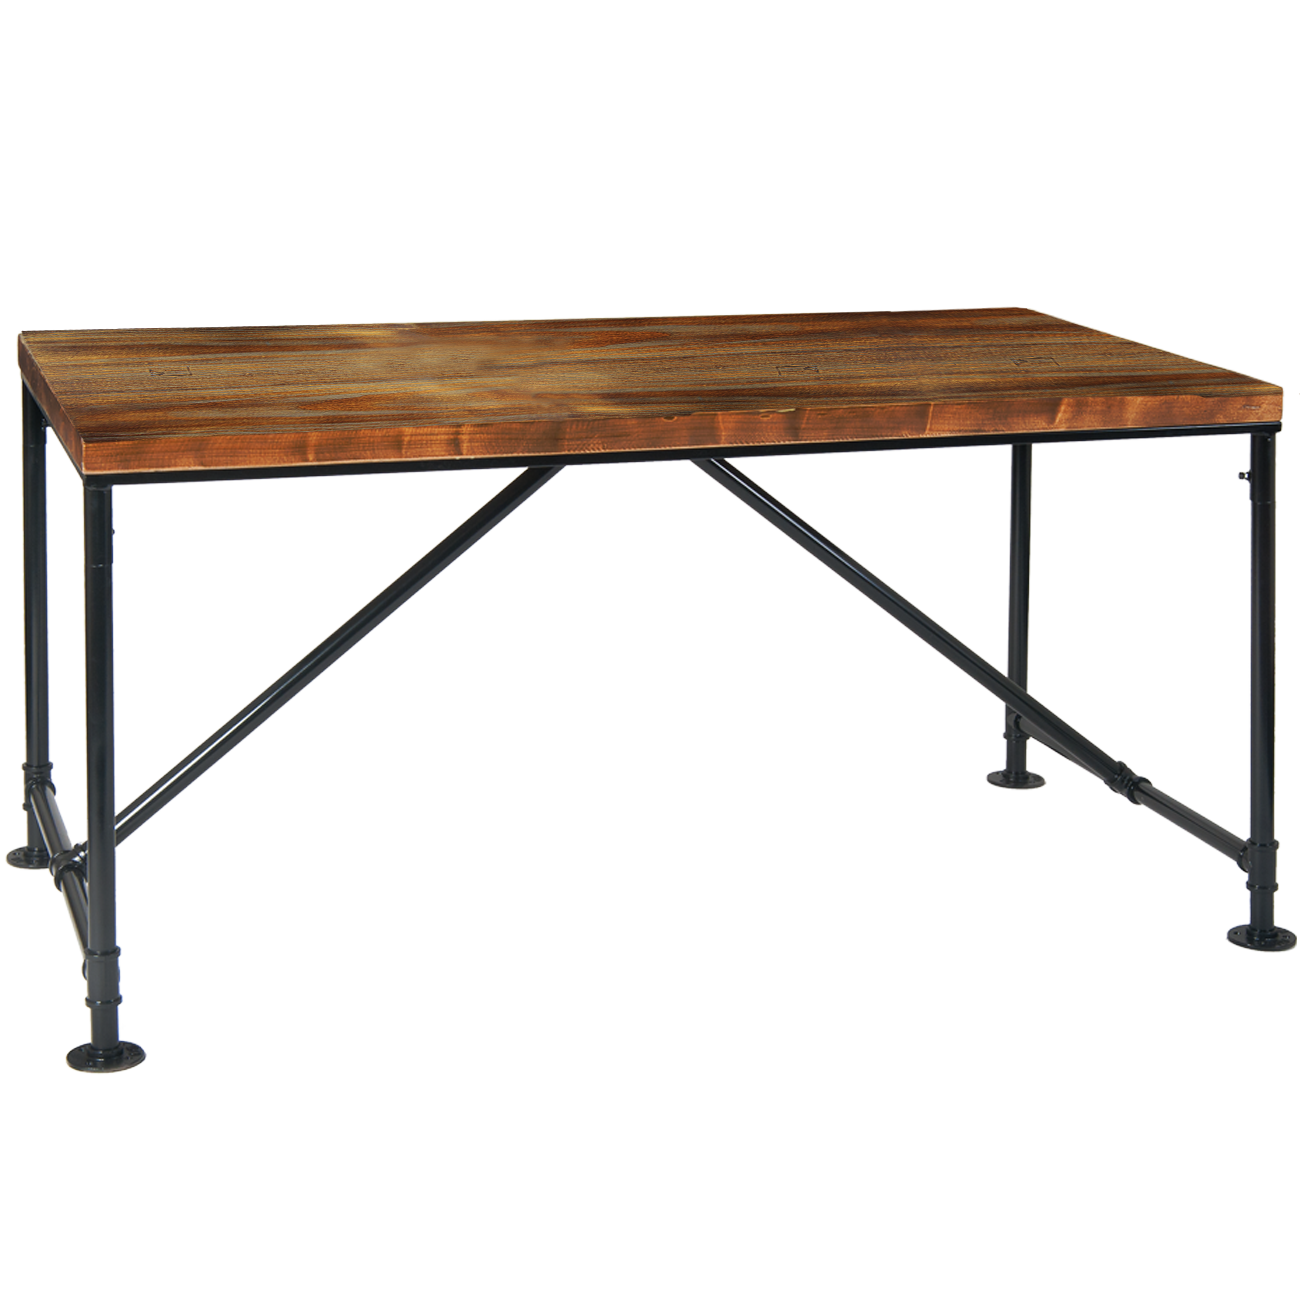 Superb 32 X 60 Pinewood Table Top W Black Pipe Metal Base Machost Co Dining Chair Design Ideas Machostcouk